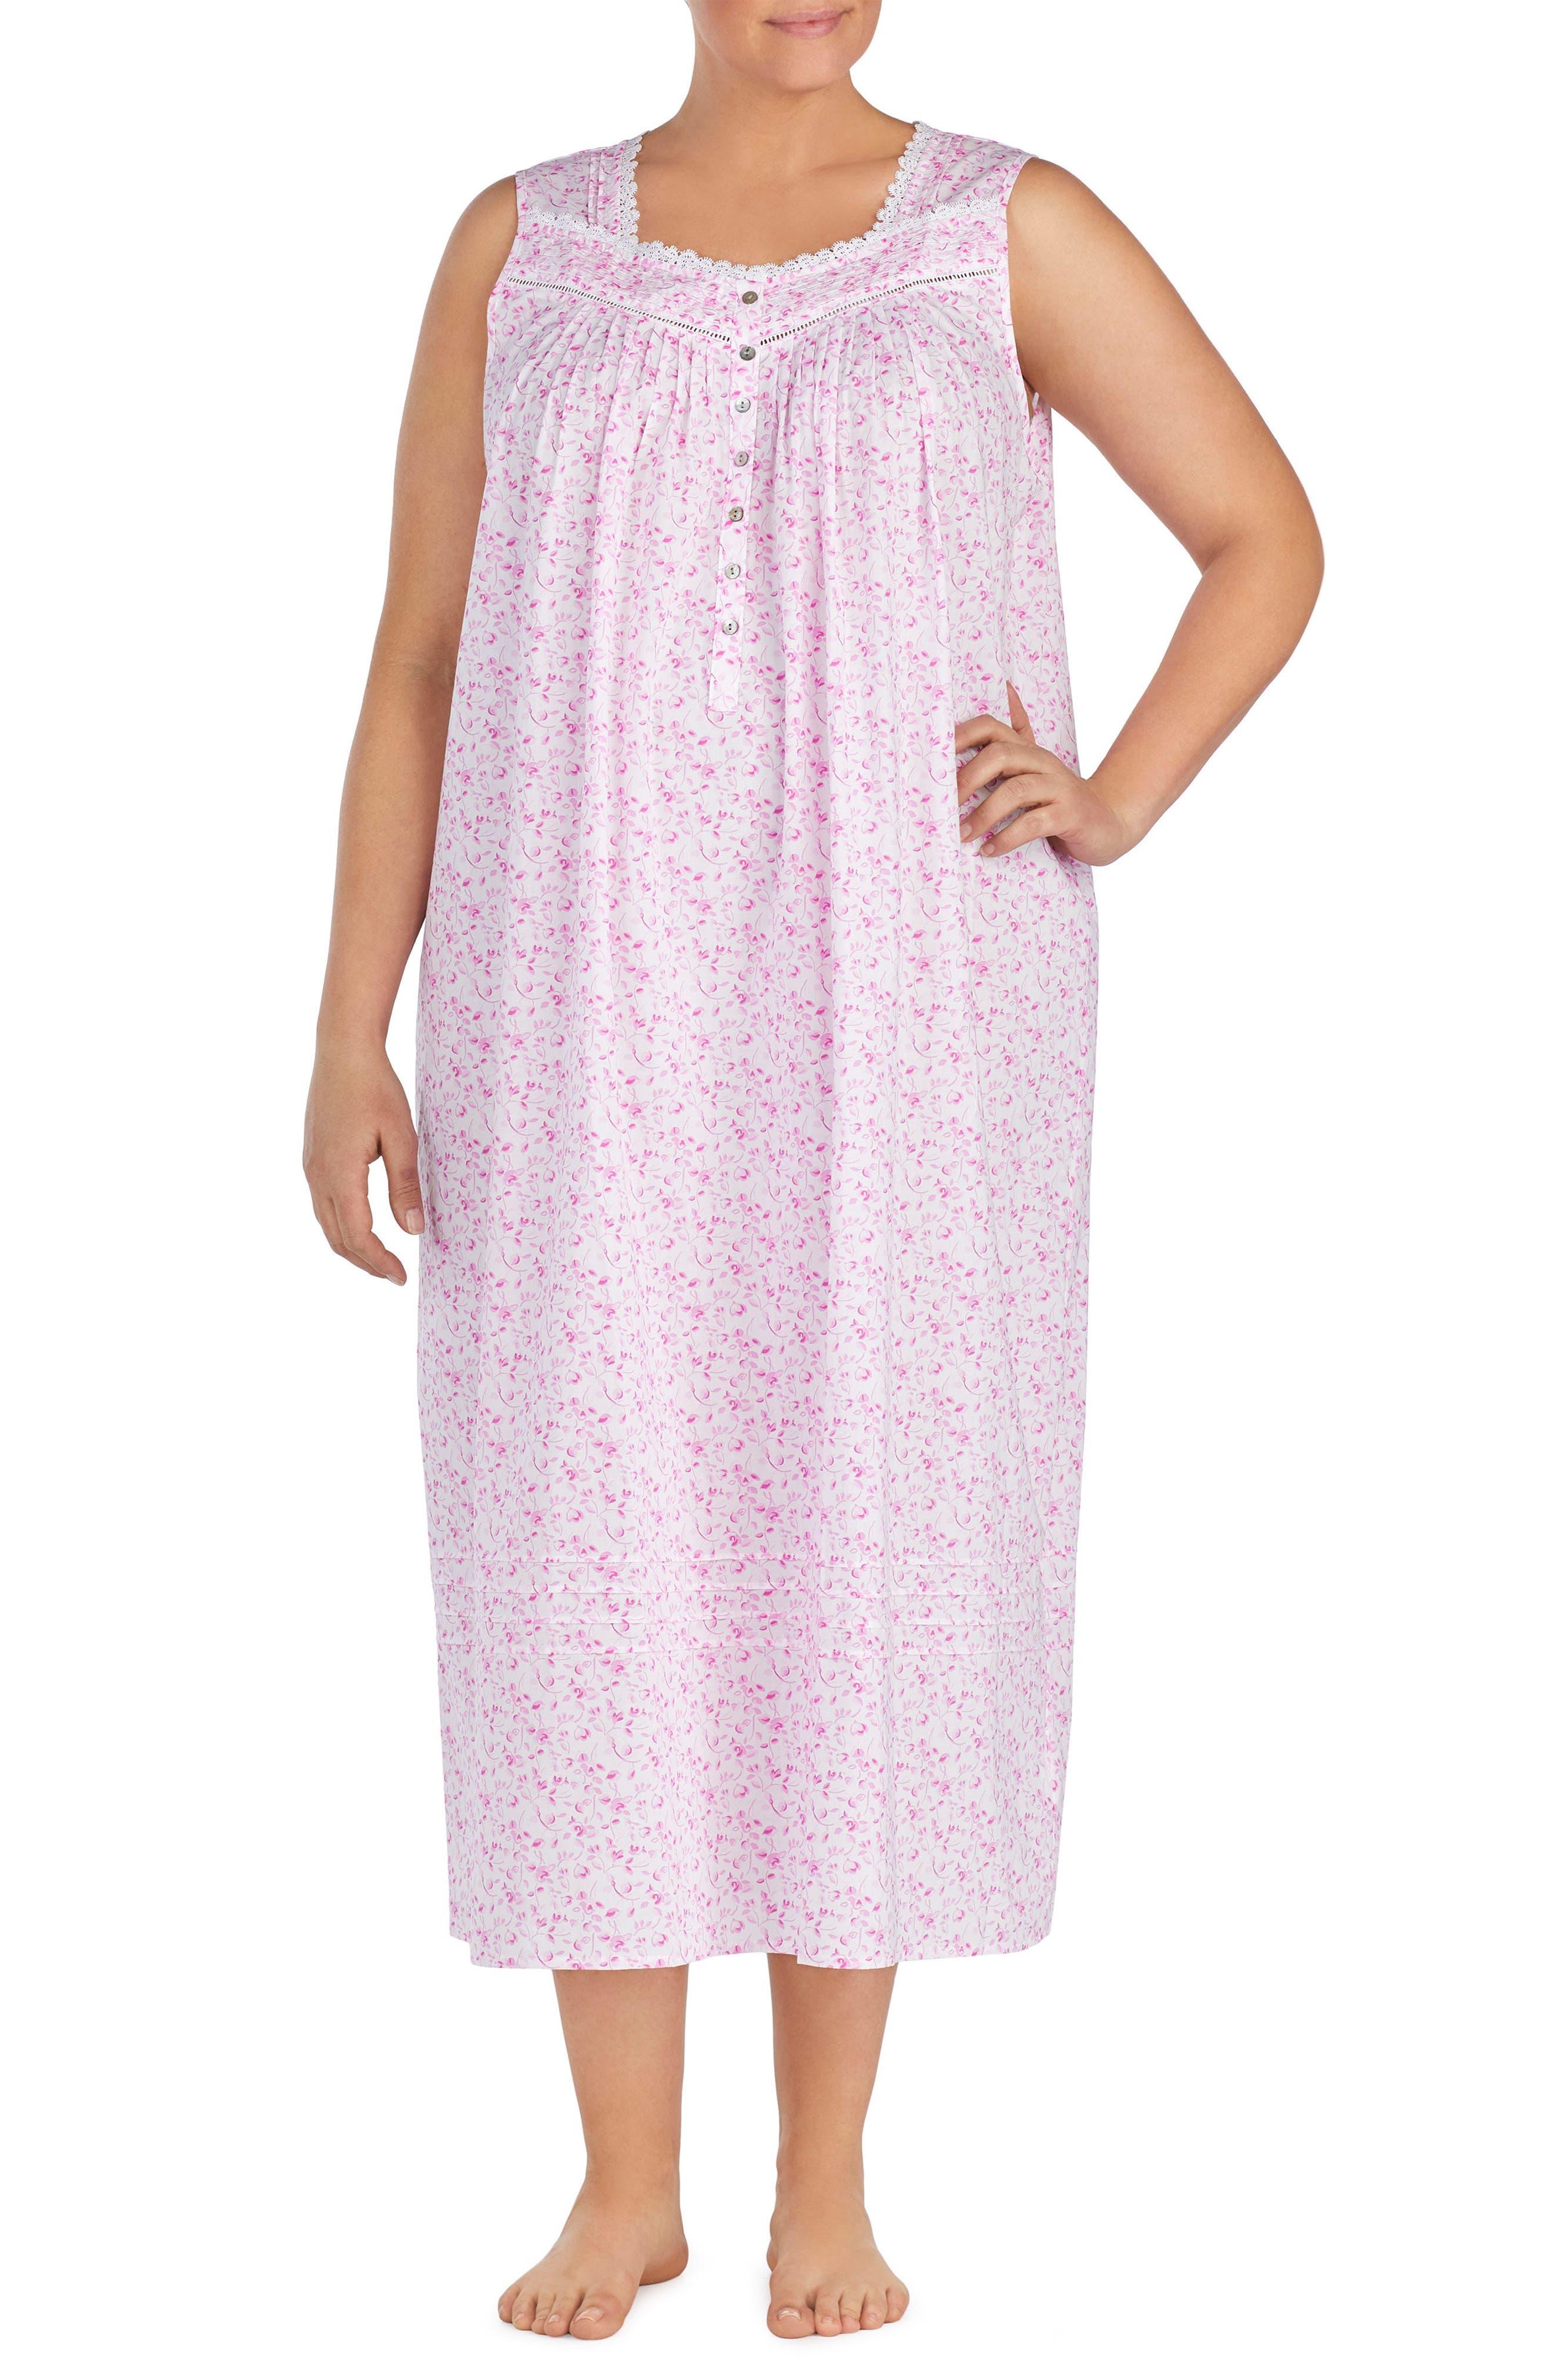 Cotton Lawn Ballet Nightgown,                             Main thumbnail 1, color,                             Rose Floral